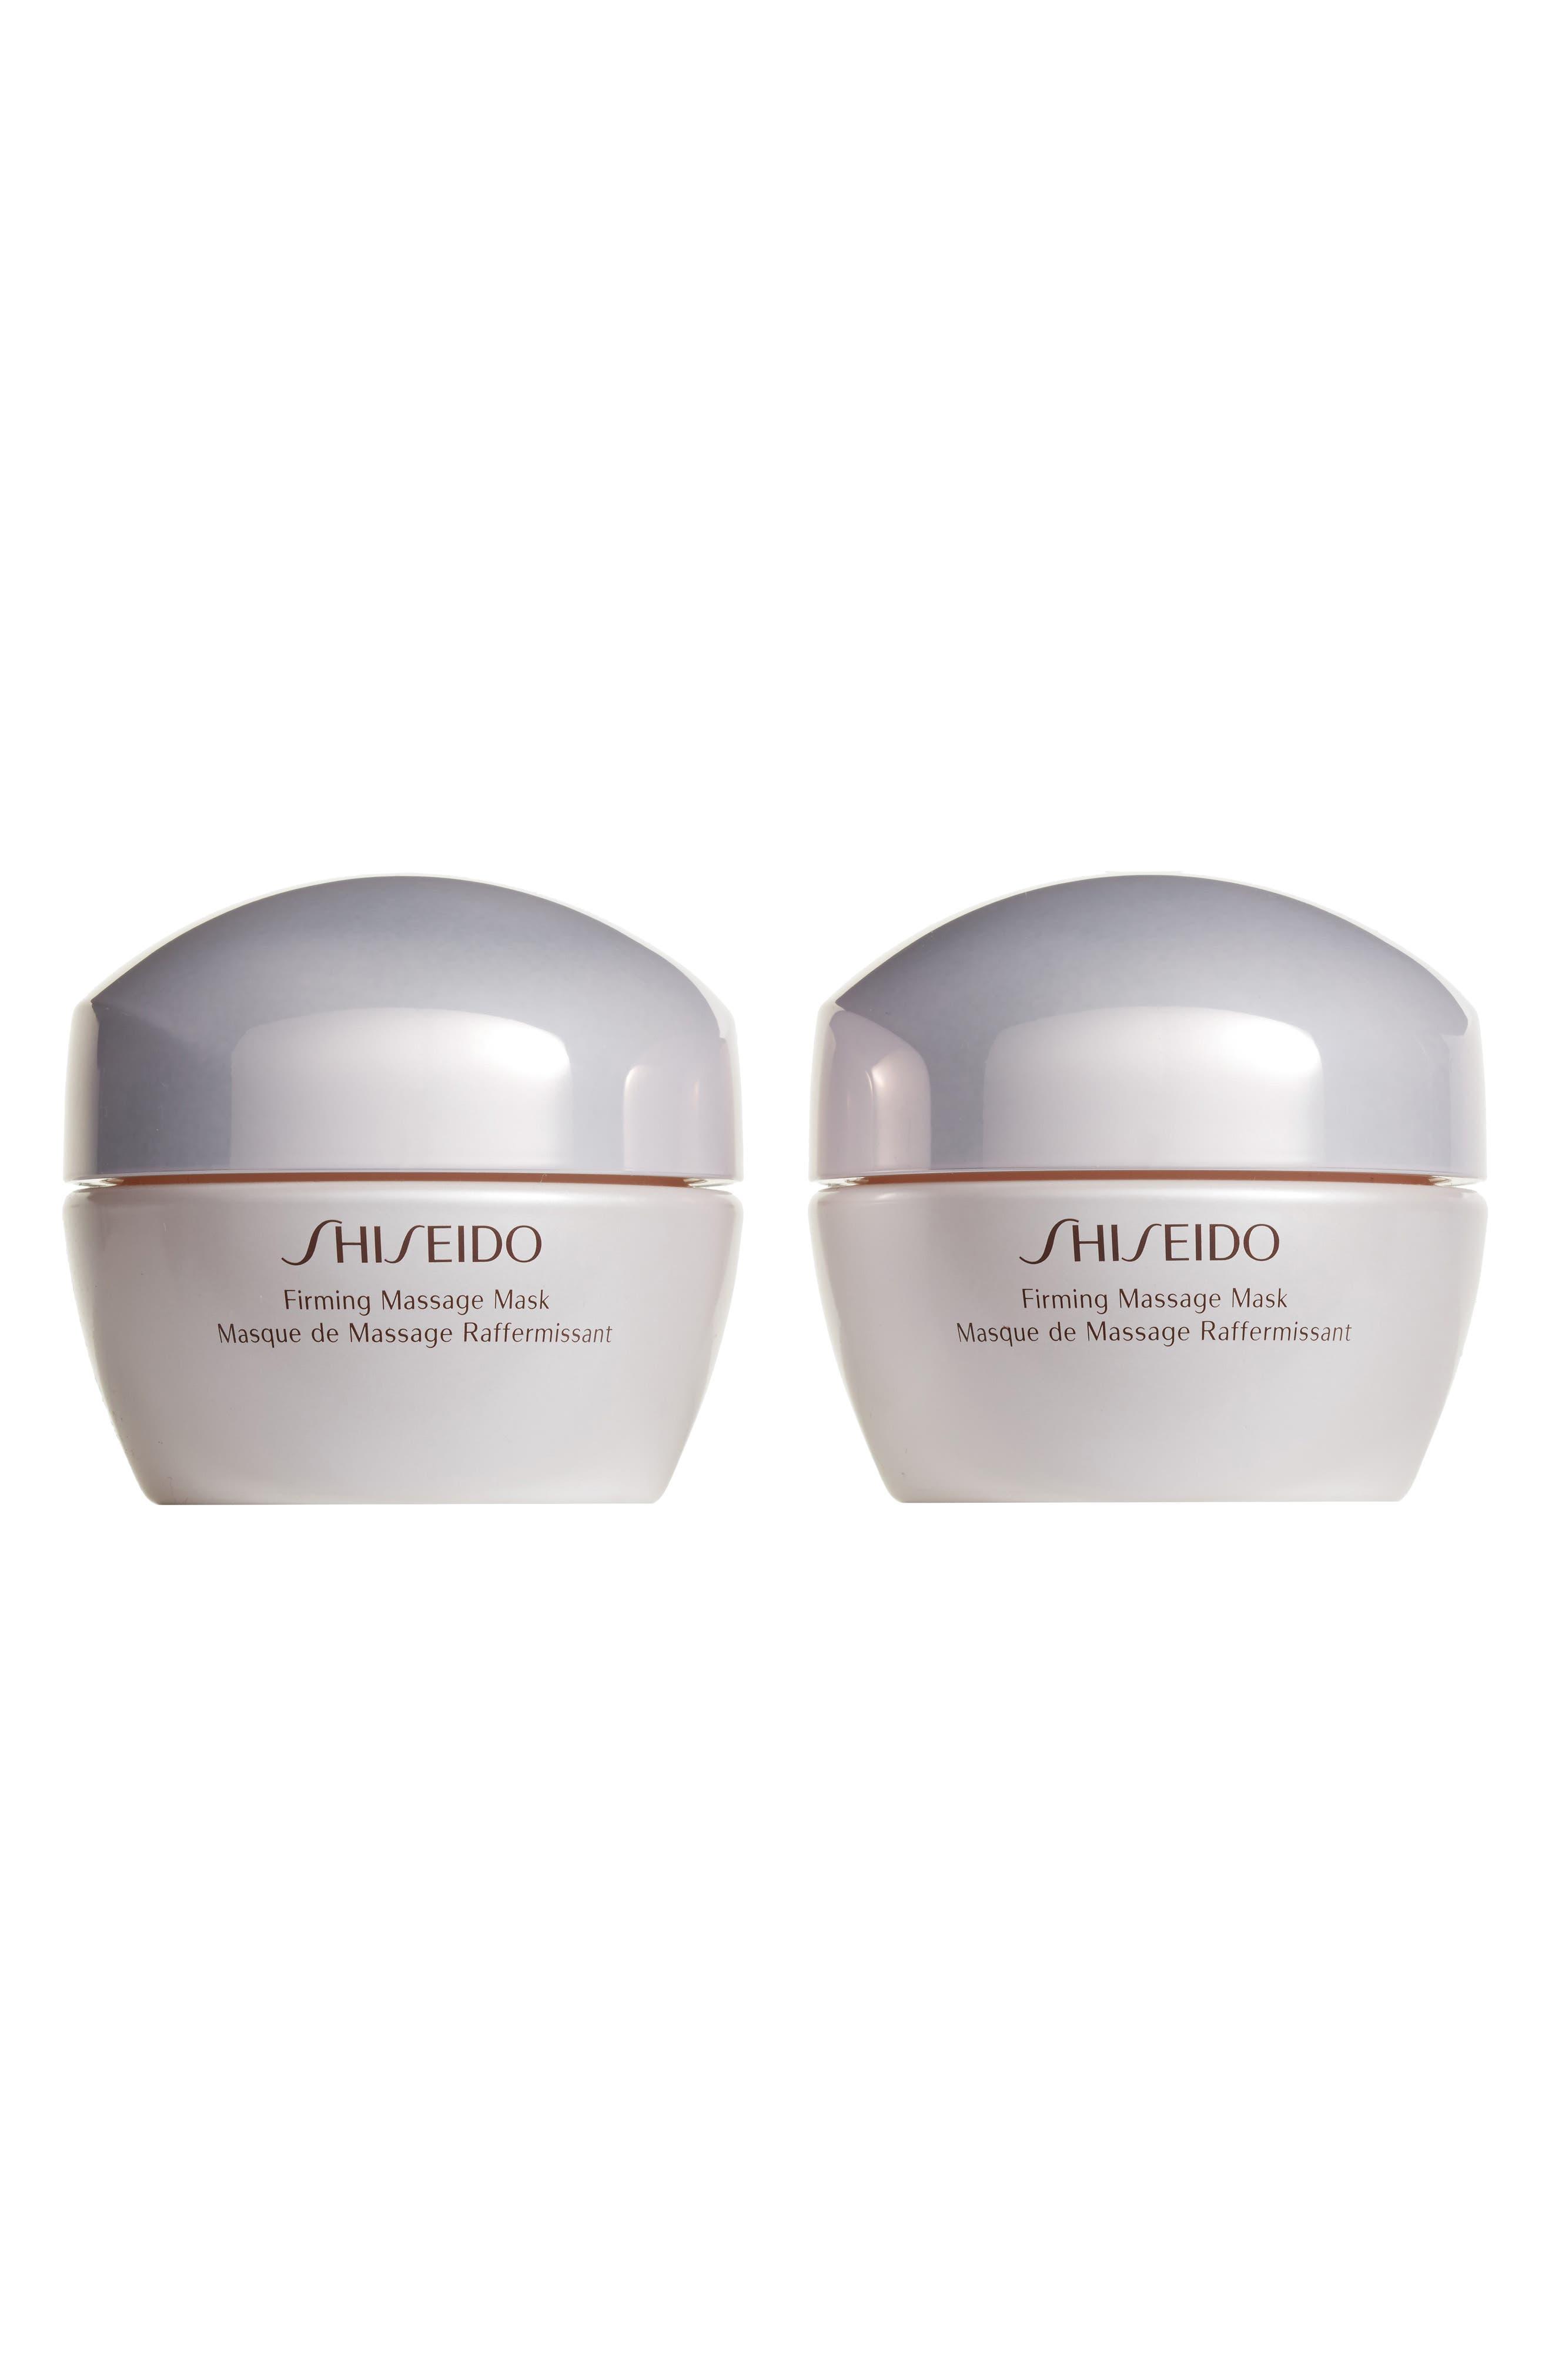 Shiseido Firming Massage Mask Duo ($96 Value)